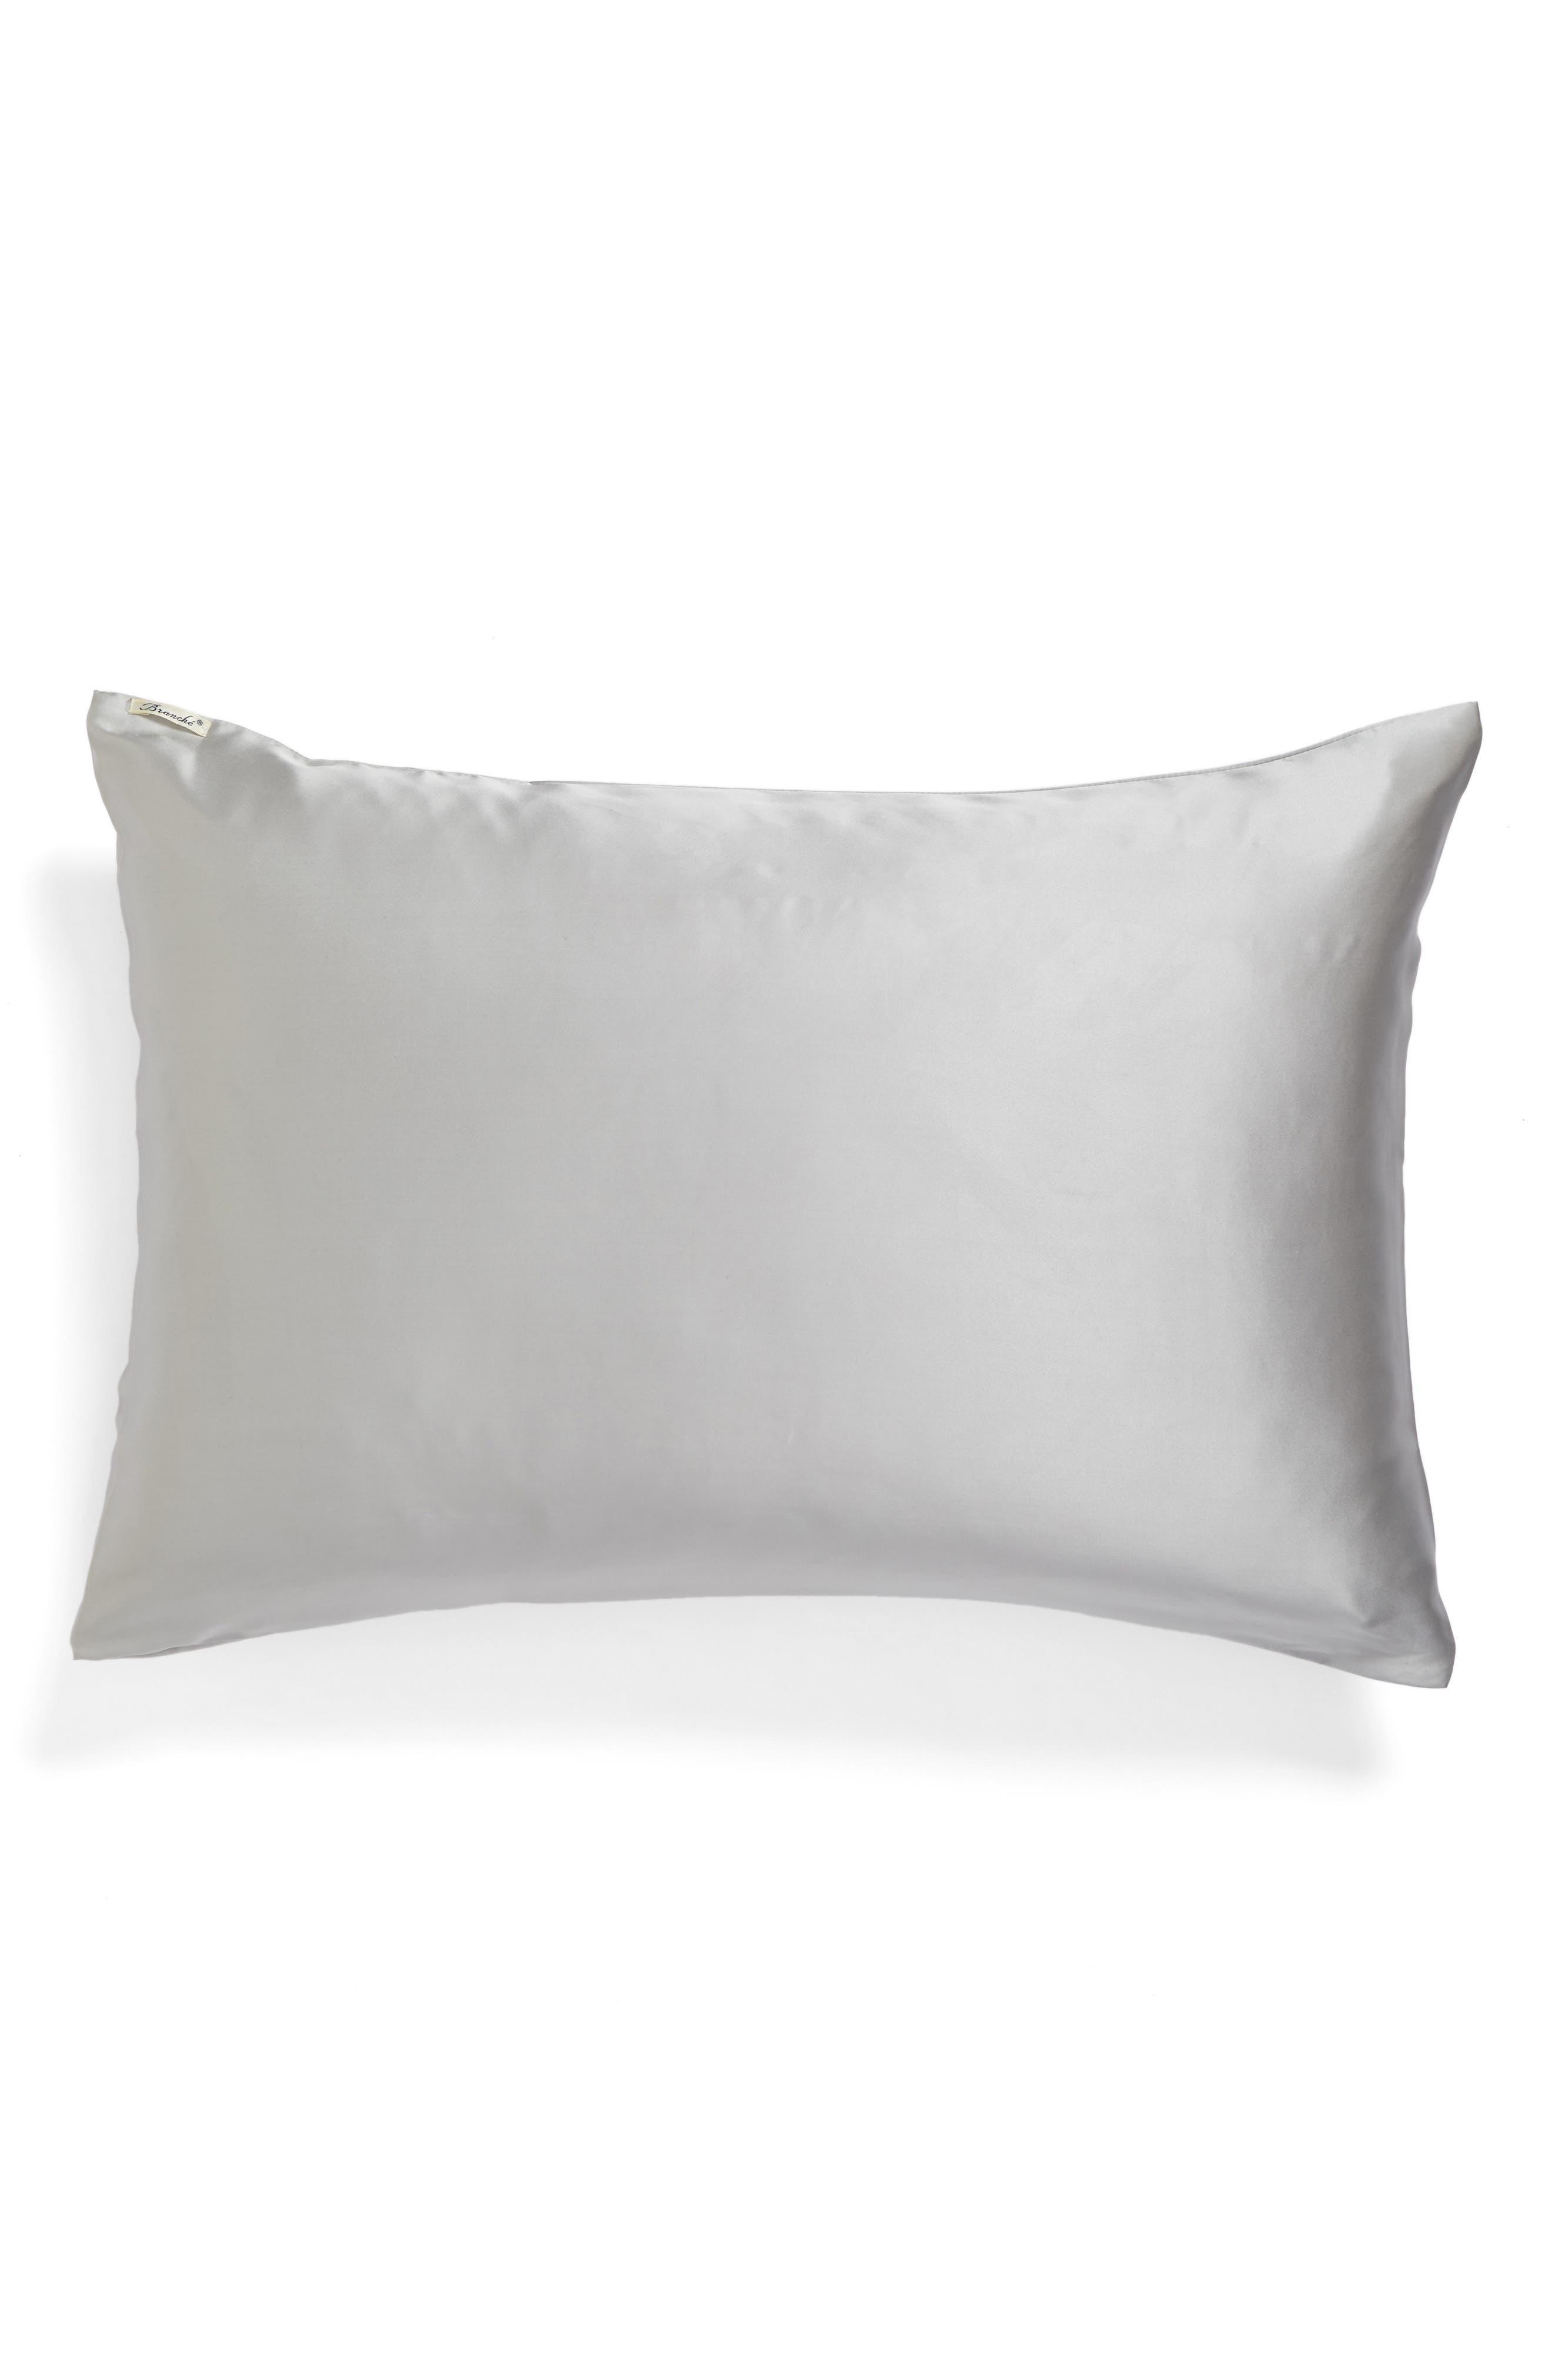 Main Image - Branché Beauty Silk Charmeuse Pillowcase